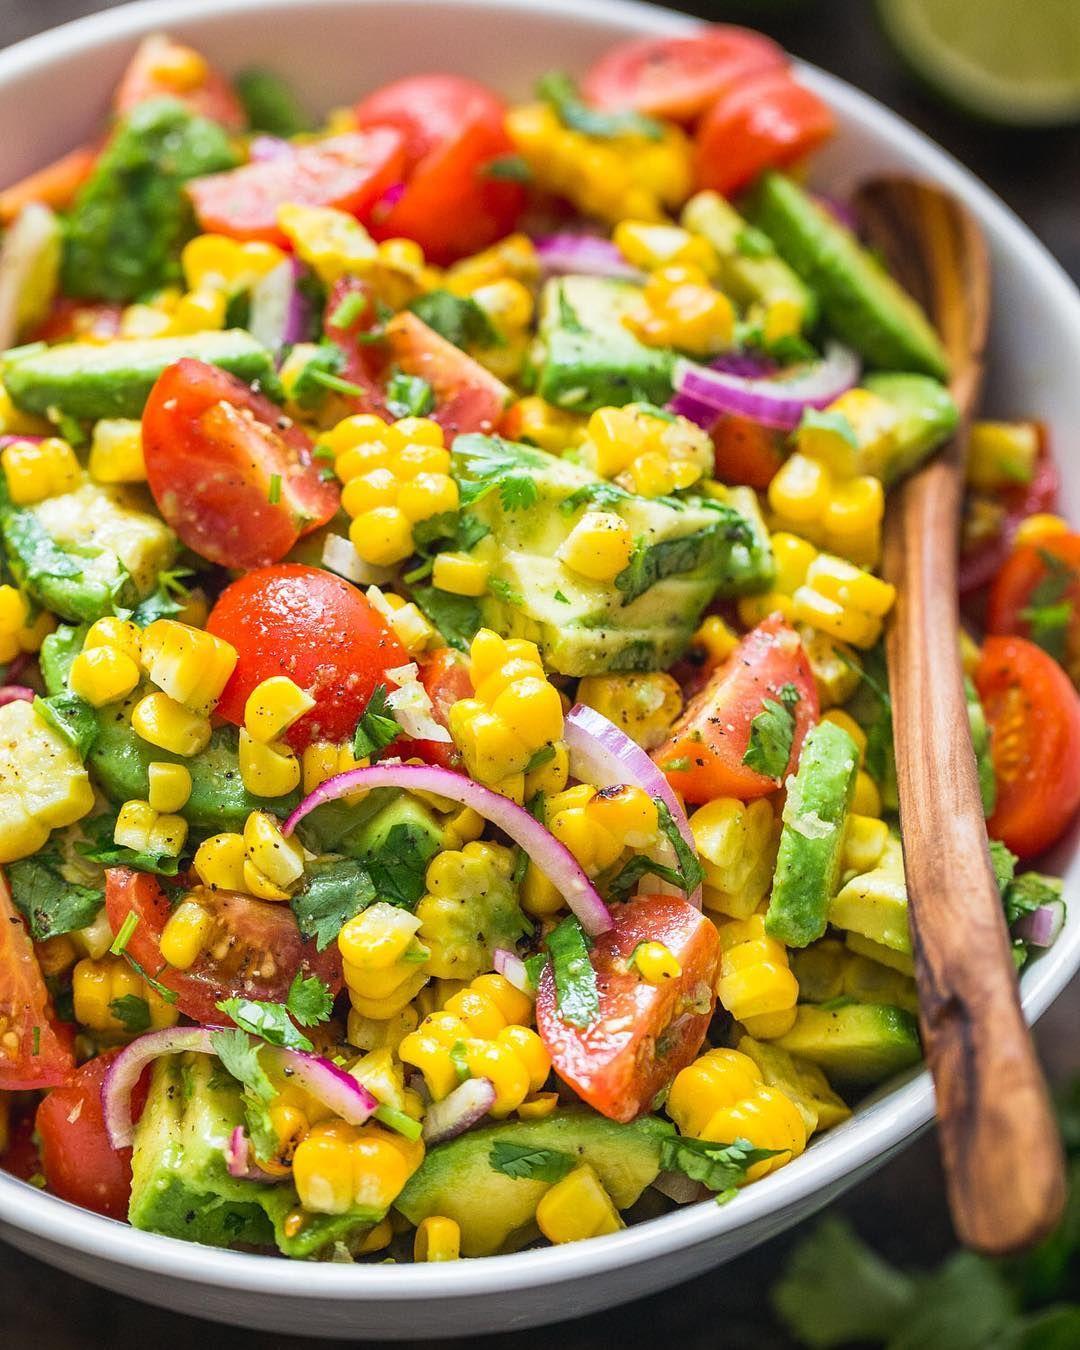 Salades Composee Pour Barbecue : salades, composee, barbecue, FRESH, Summer!!, Salad, Perfect, Potlucks, Summer, BBQ's!, Recipe, Natashaskitc…, Salade, Barbecue,, D'avocat,, Recettes, Cuisine